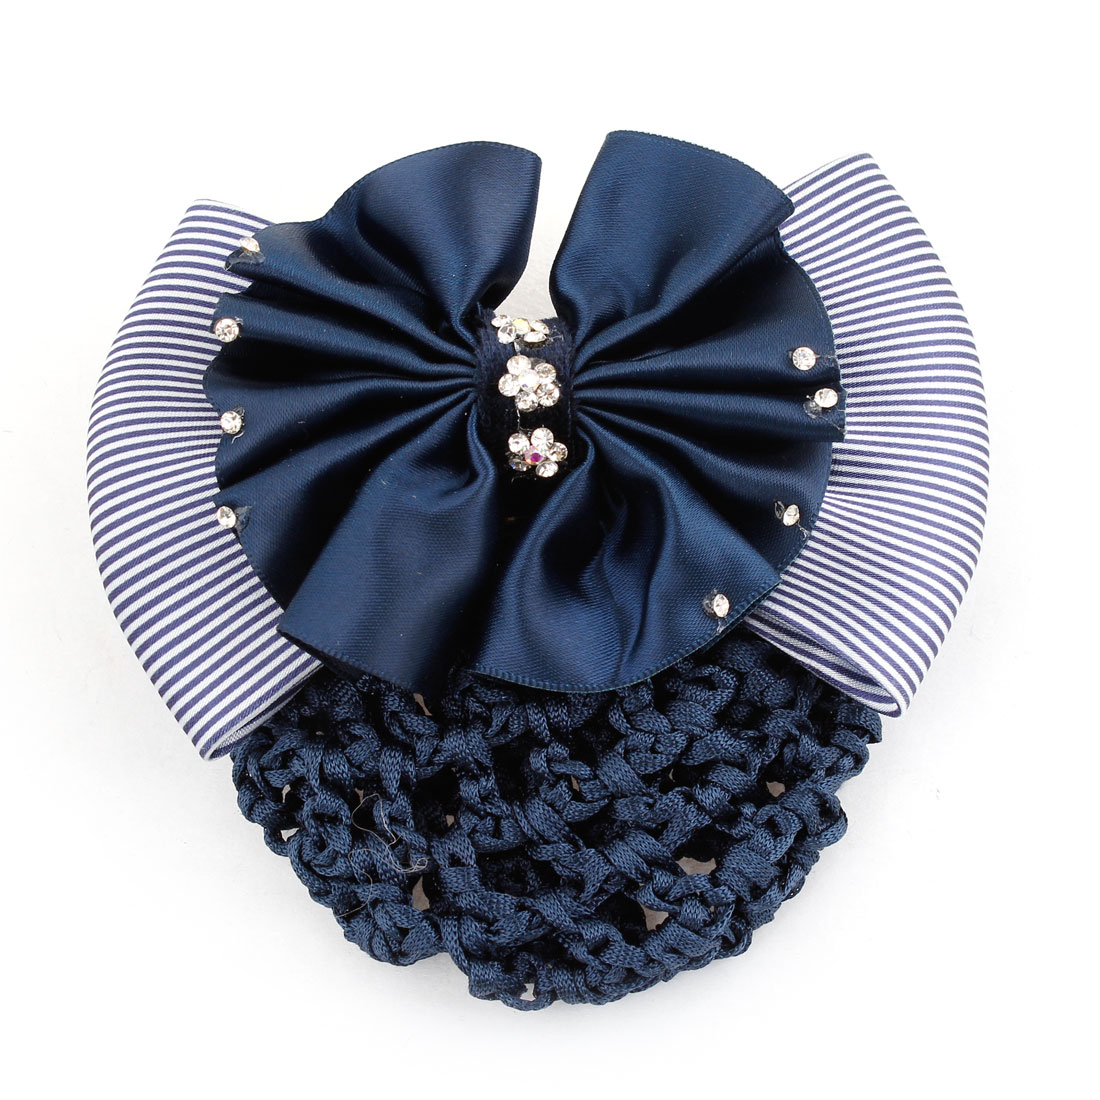 Woman Bowtie Rhinestones Flower Detail Hairnet Snood Net Hair Clip Navy Blue